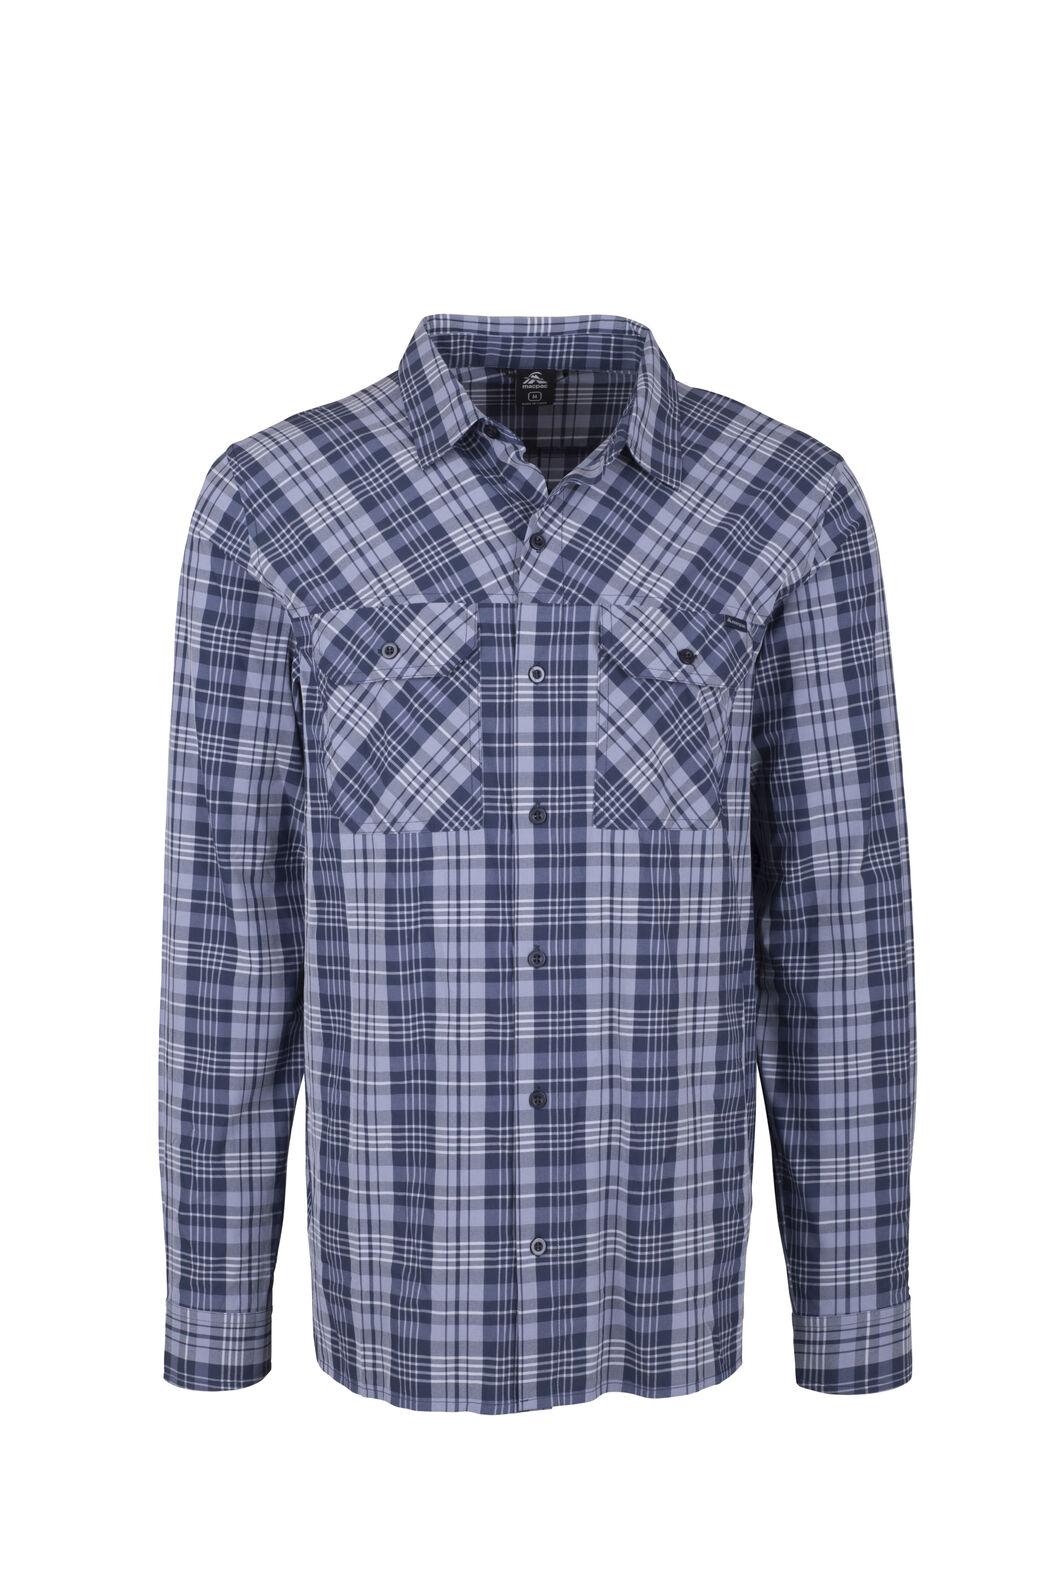 Macpac Eclipse Long Sleeve Shirt — Men's, Black Iris, hi-res